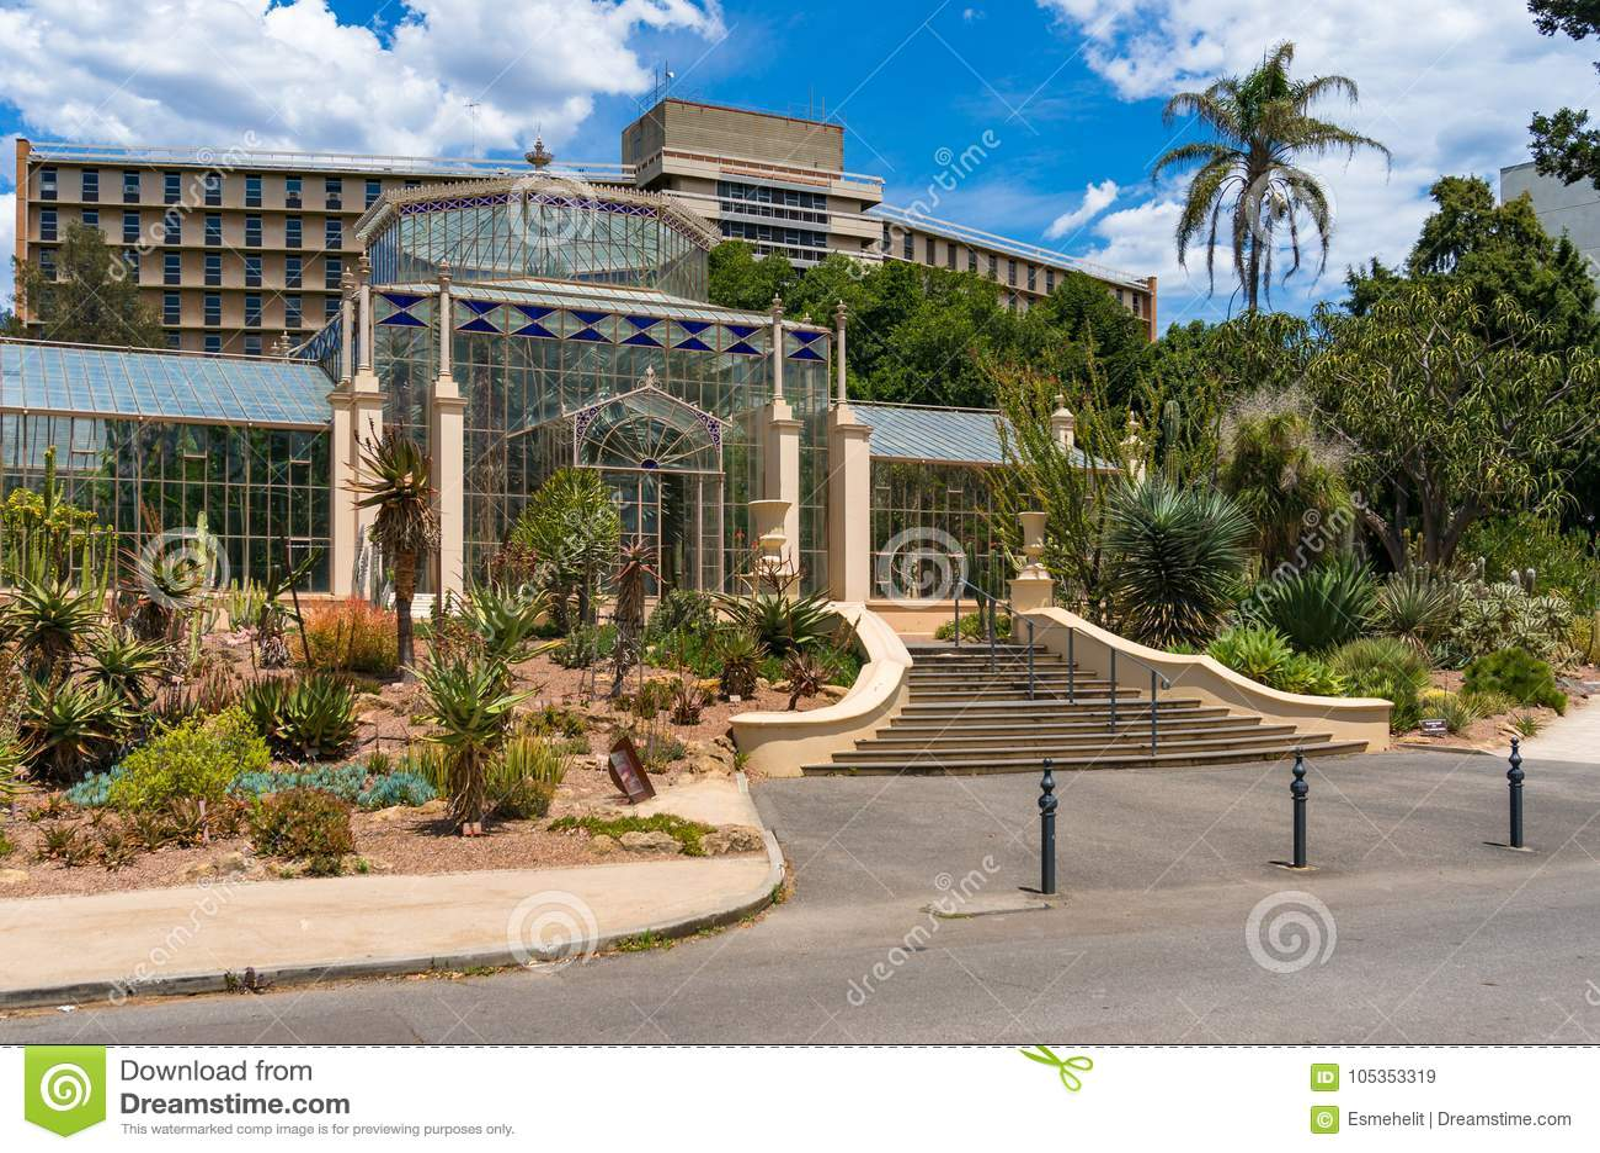 Palm House In Adelaide Botanic Garden Editorial Stock Image - Image ...